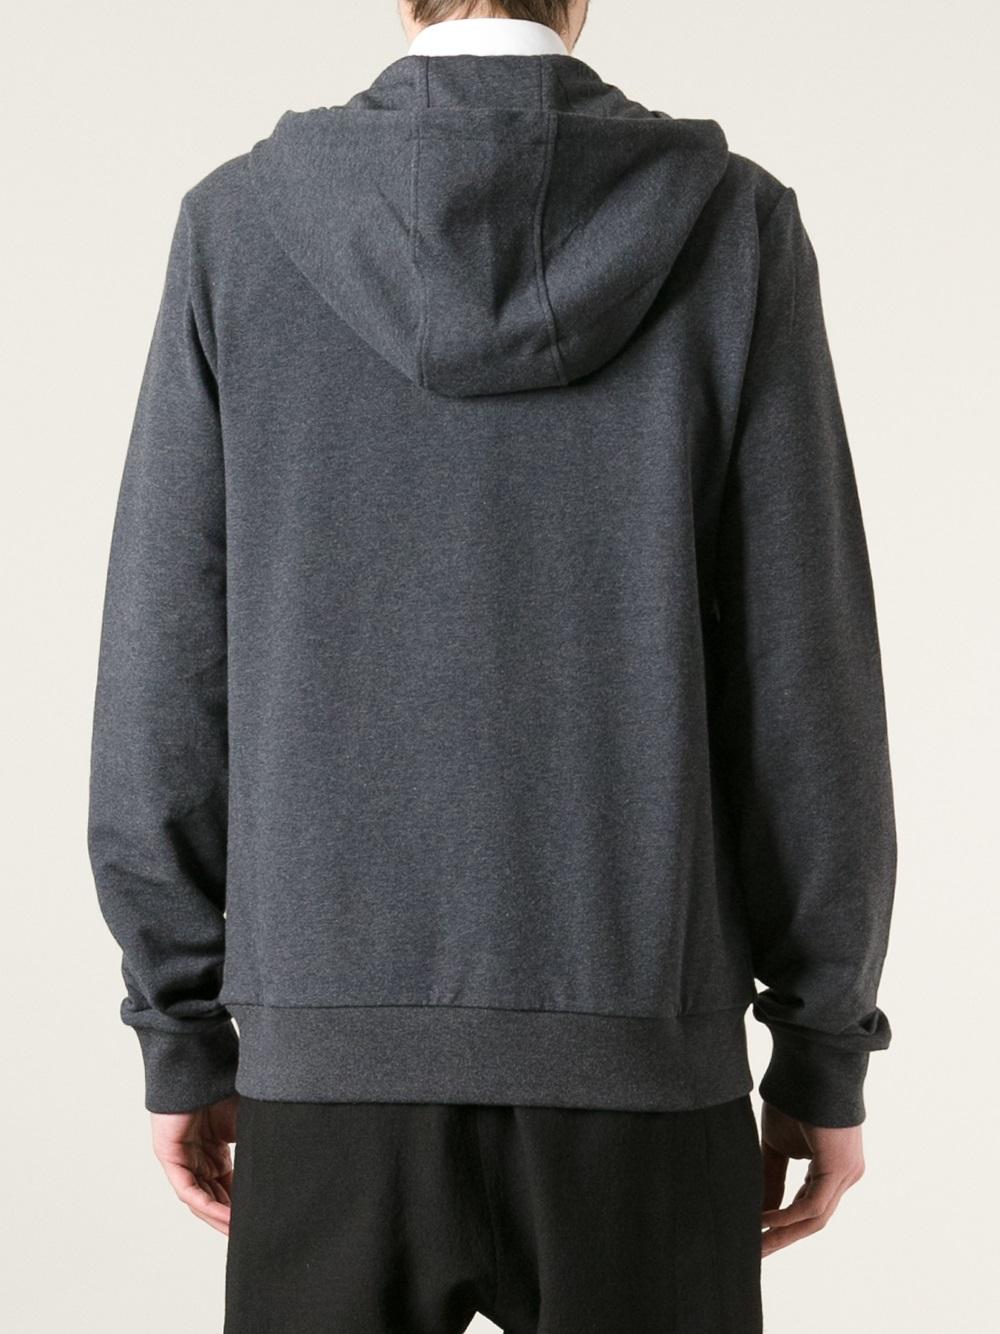 Lyst - Gucci Zip Up Hoodie in Gray for Men